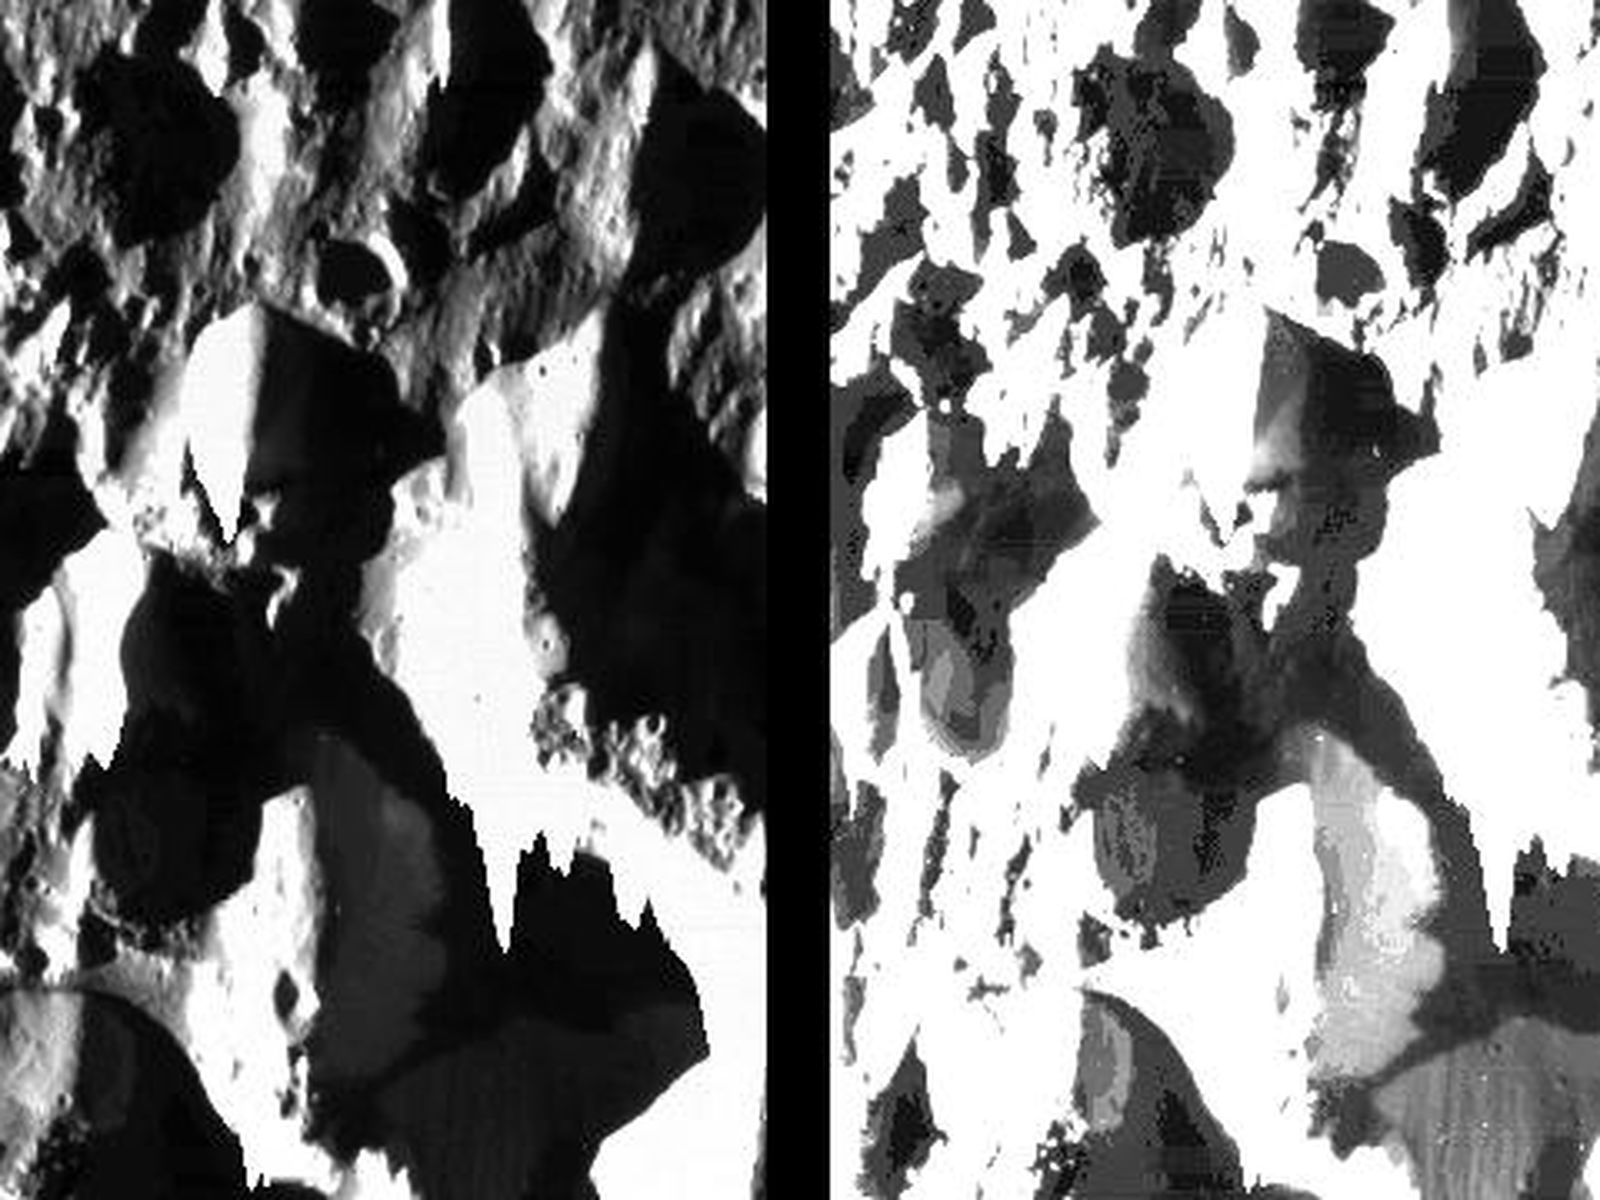 space images wallpaper nasa jet propulsion laboratory 600 X 1024 Minimalistic Wallpaper 1920 x 1200 applying wallpaper